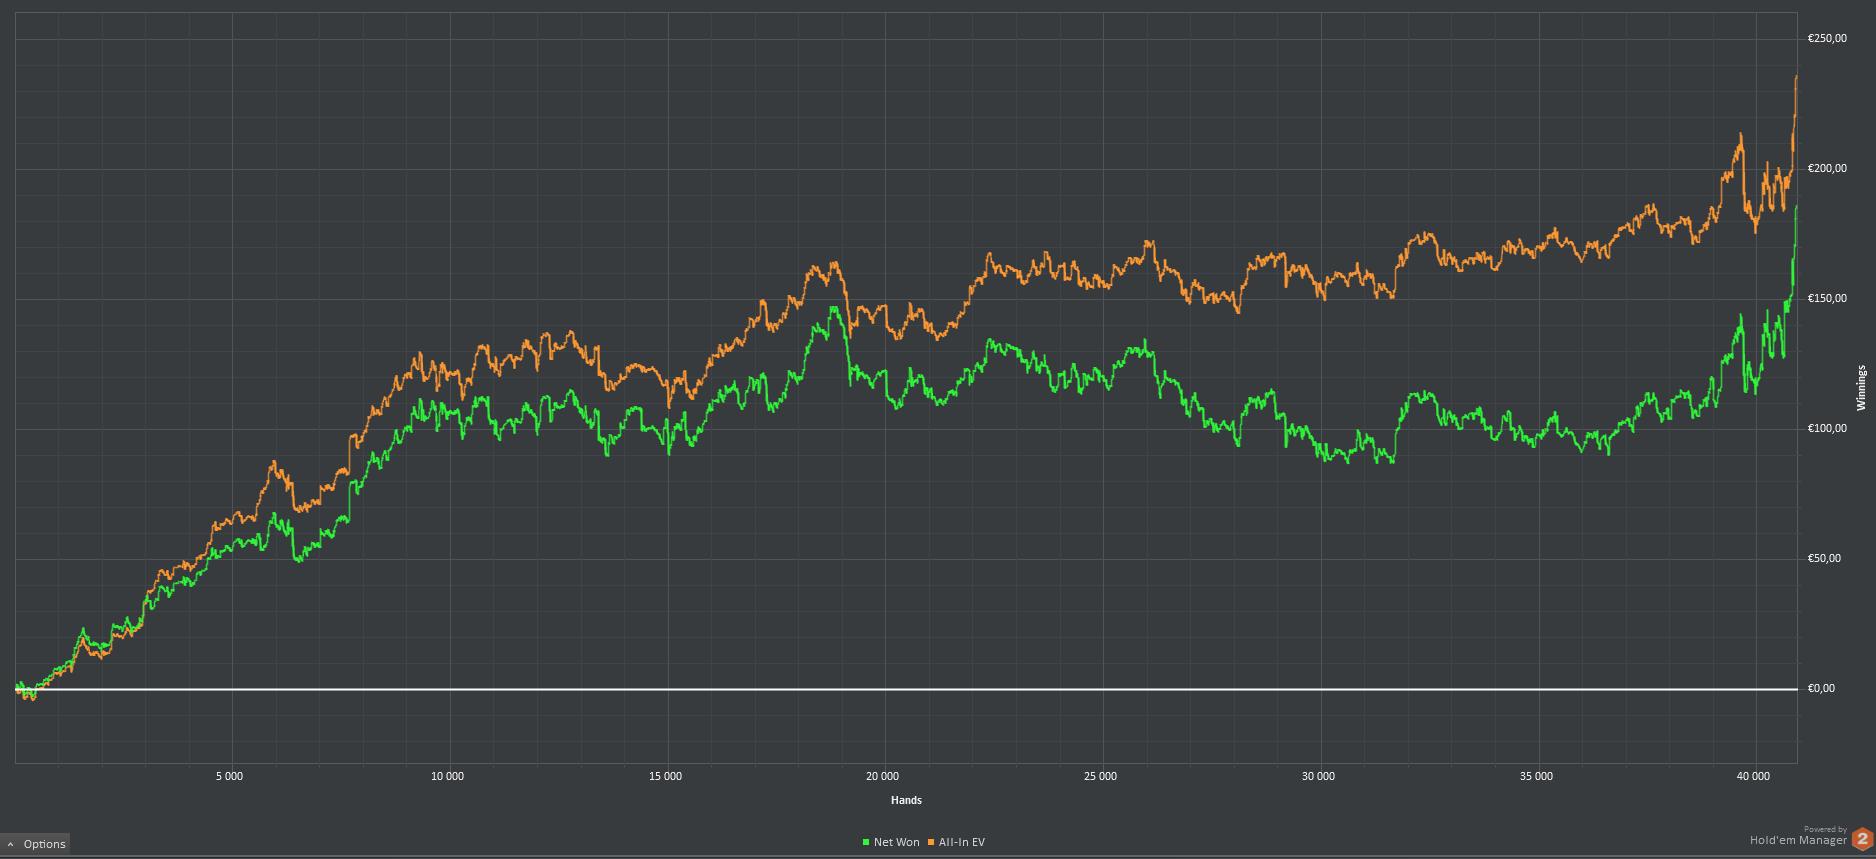 Graphe_2014-08-31.PNG